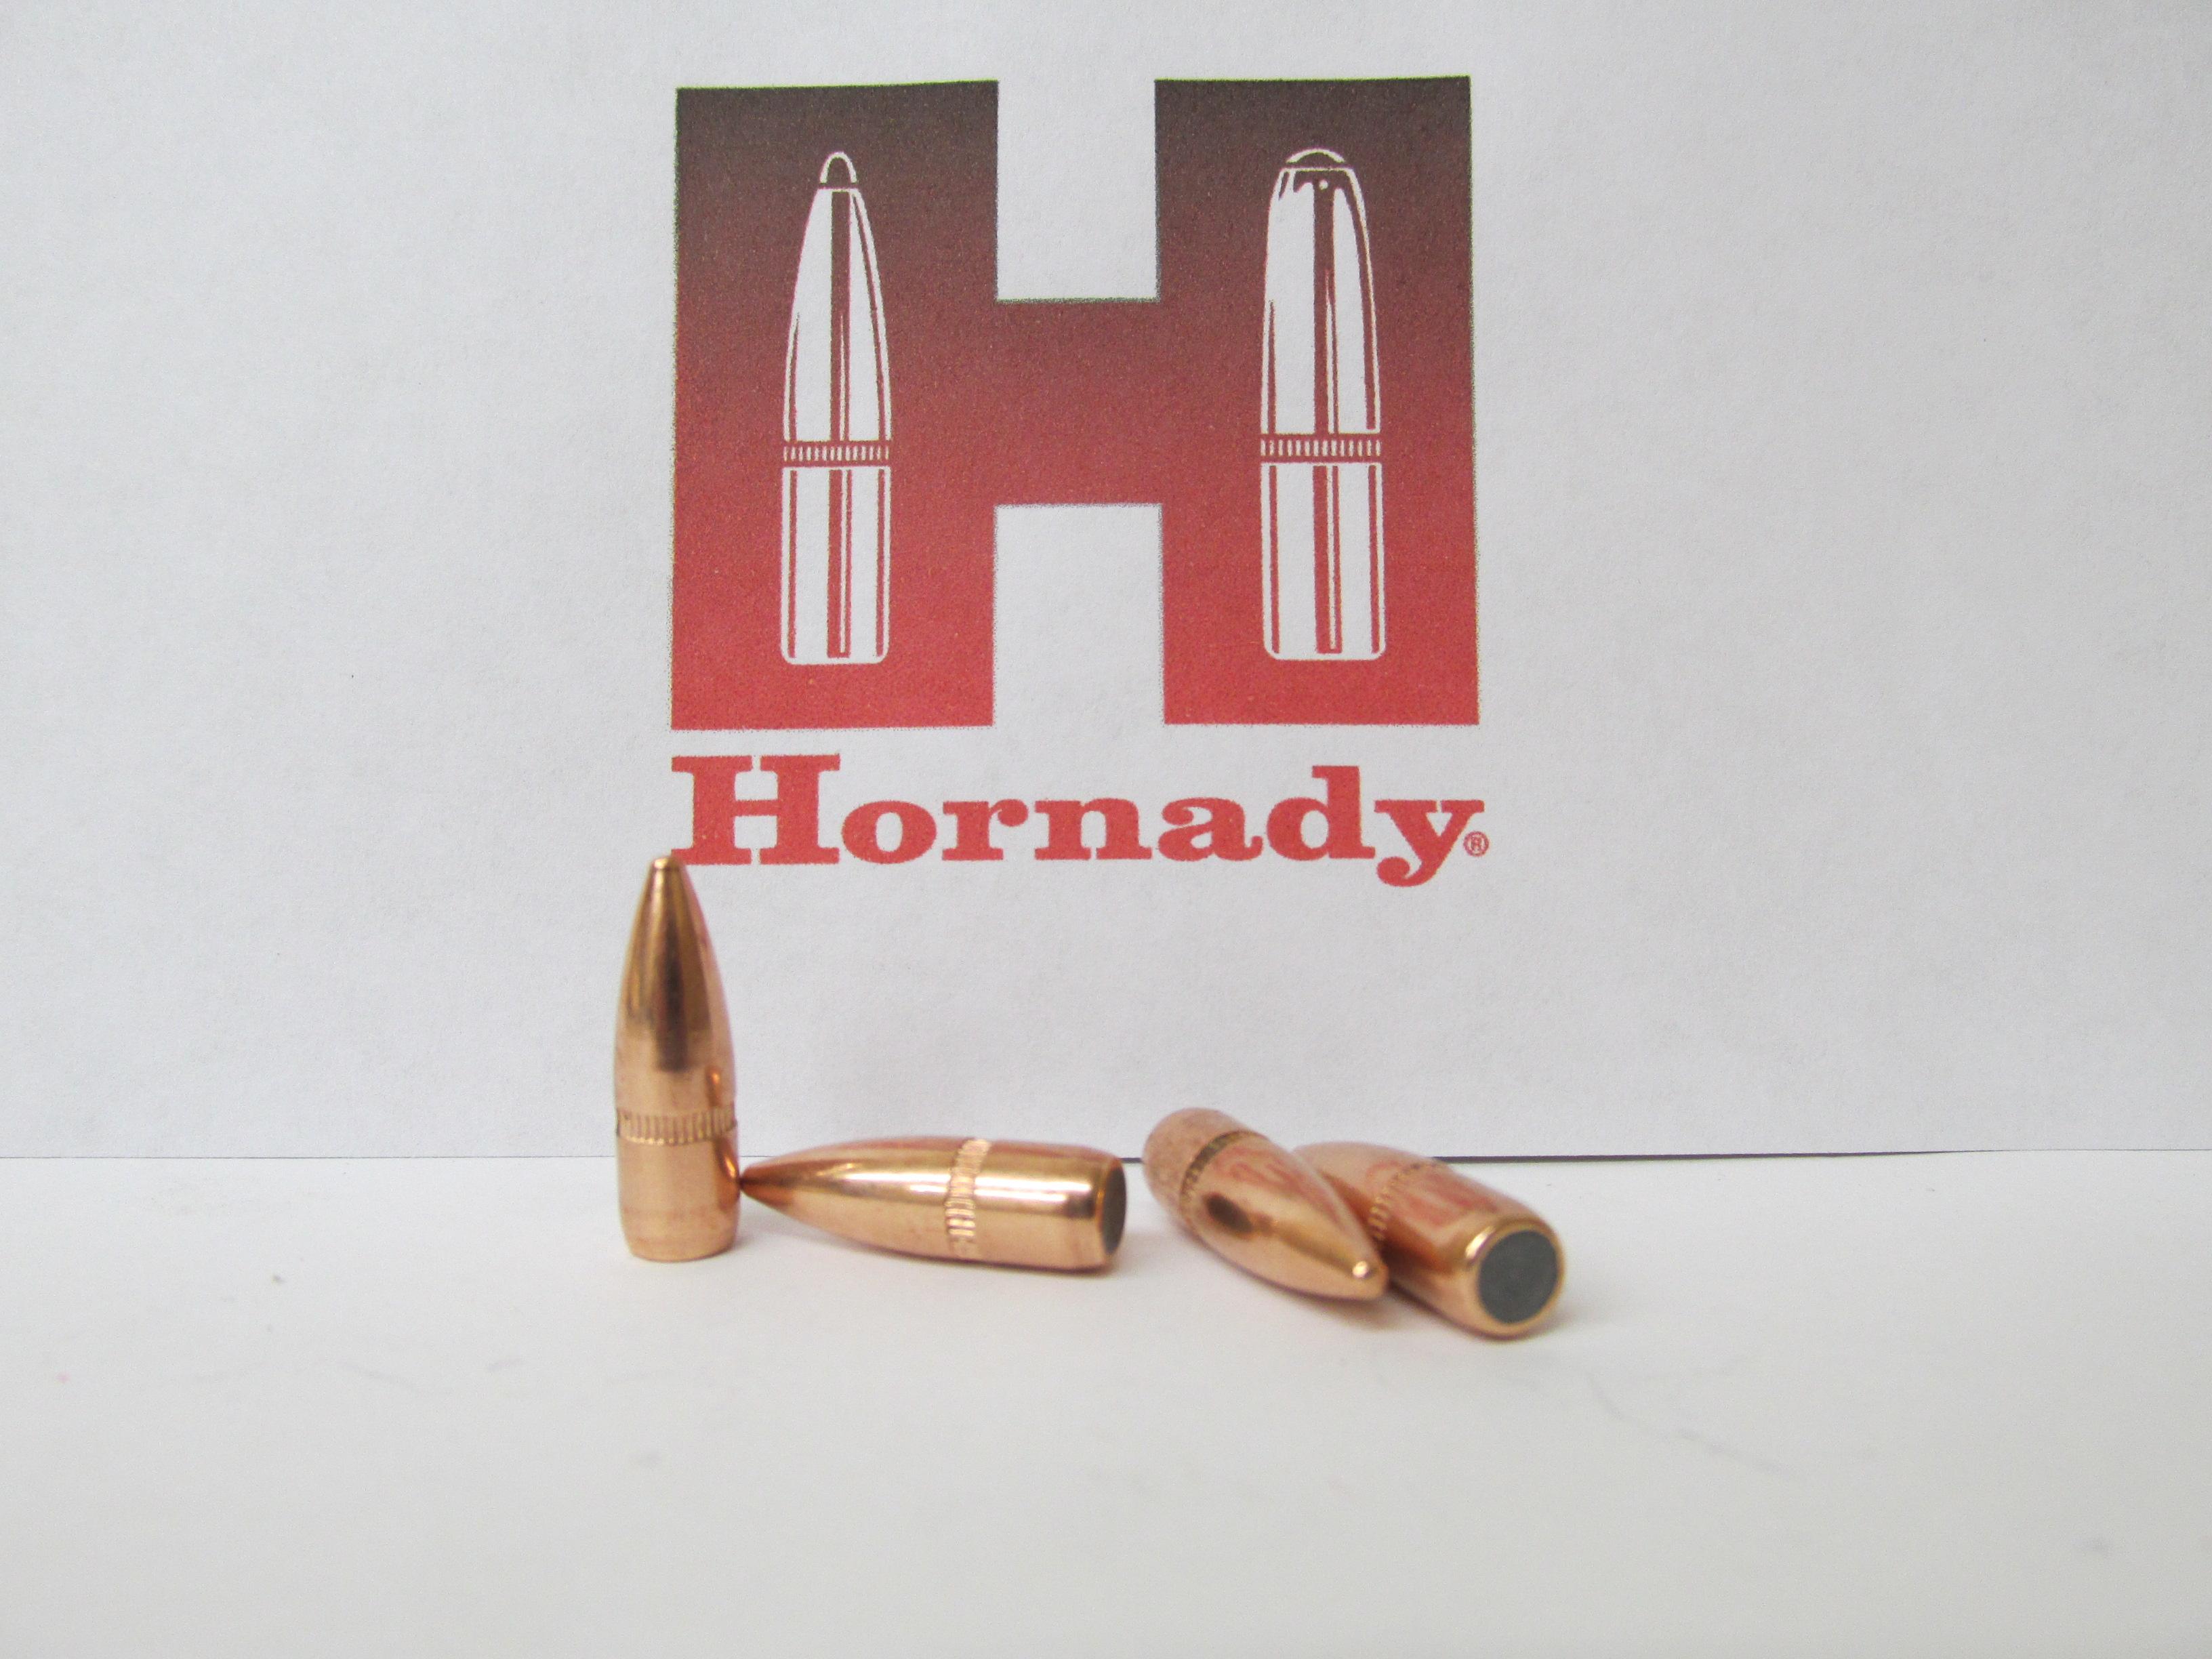 Rifle bullets 22 caliber 22 cal 224 55 gr fmj bt 22 cal 224 55 gr fmj